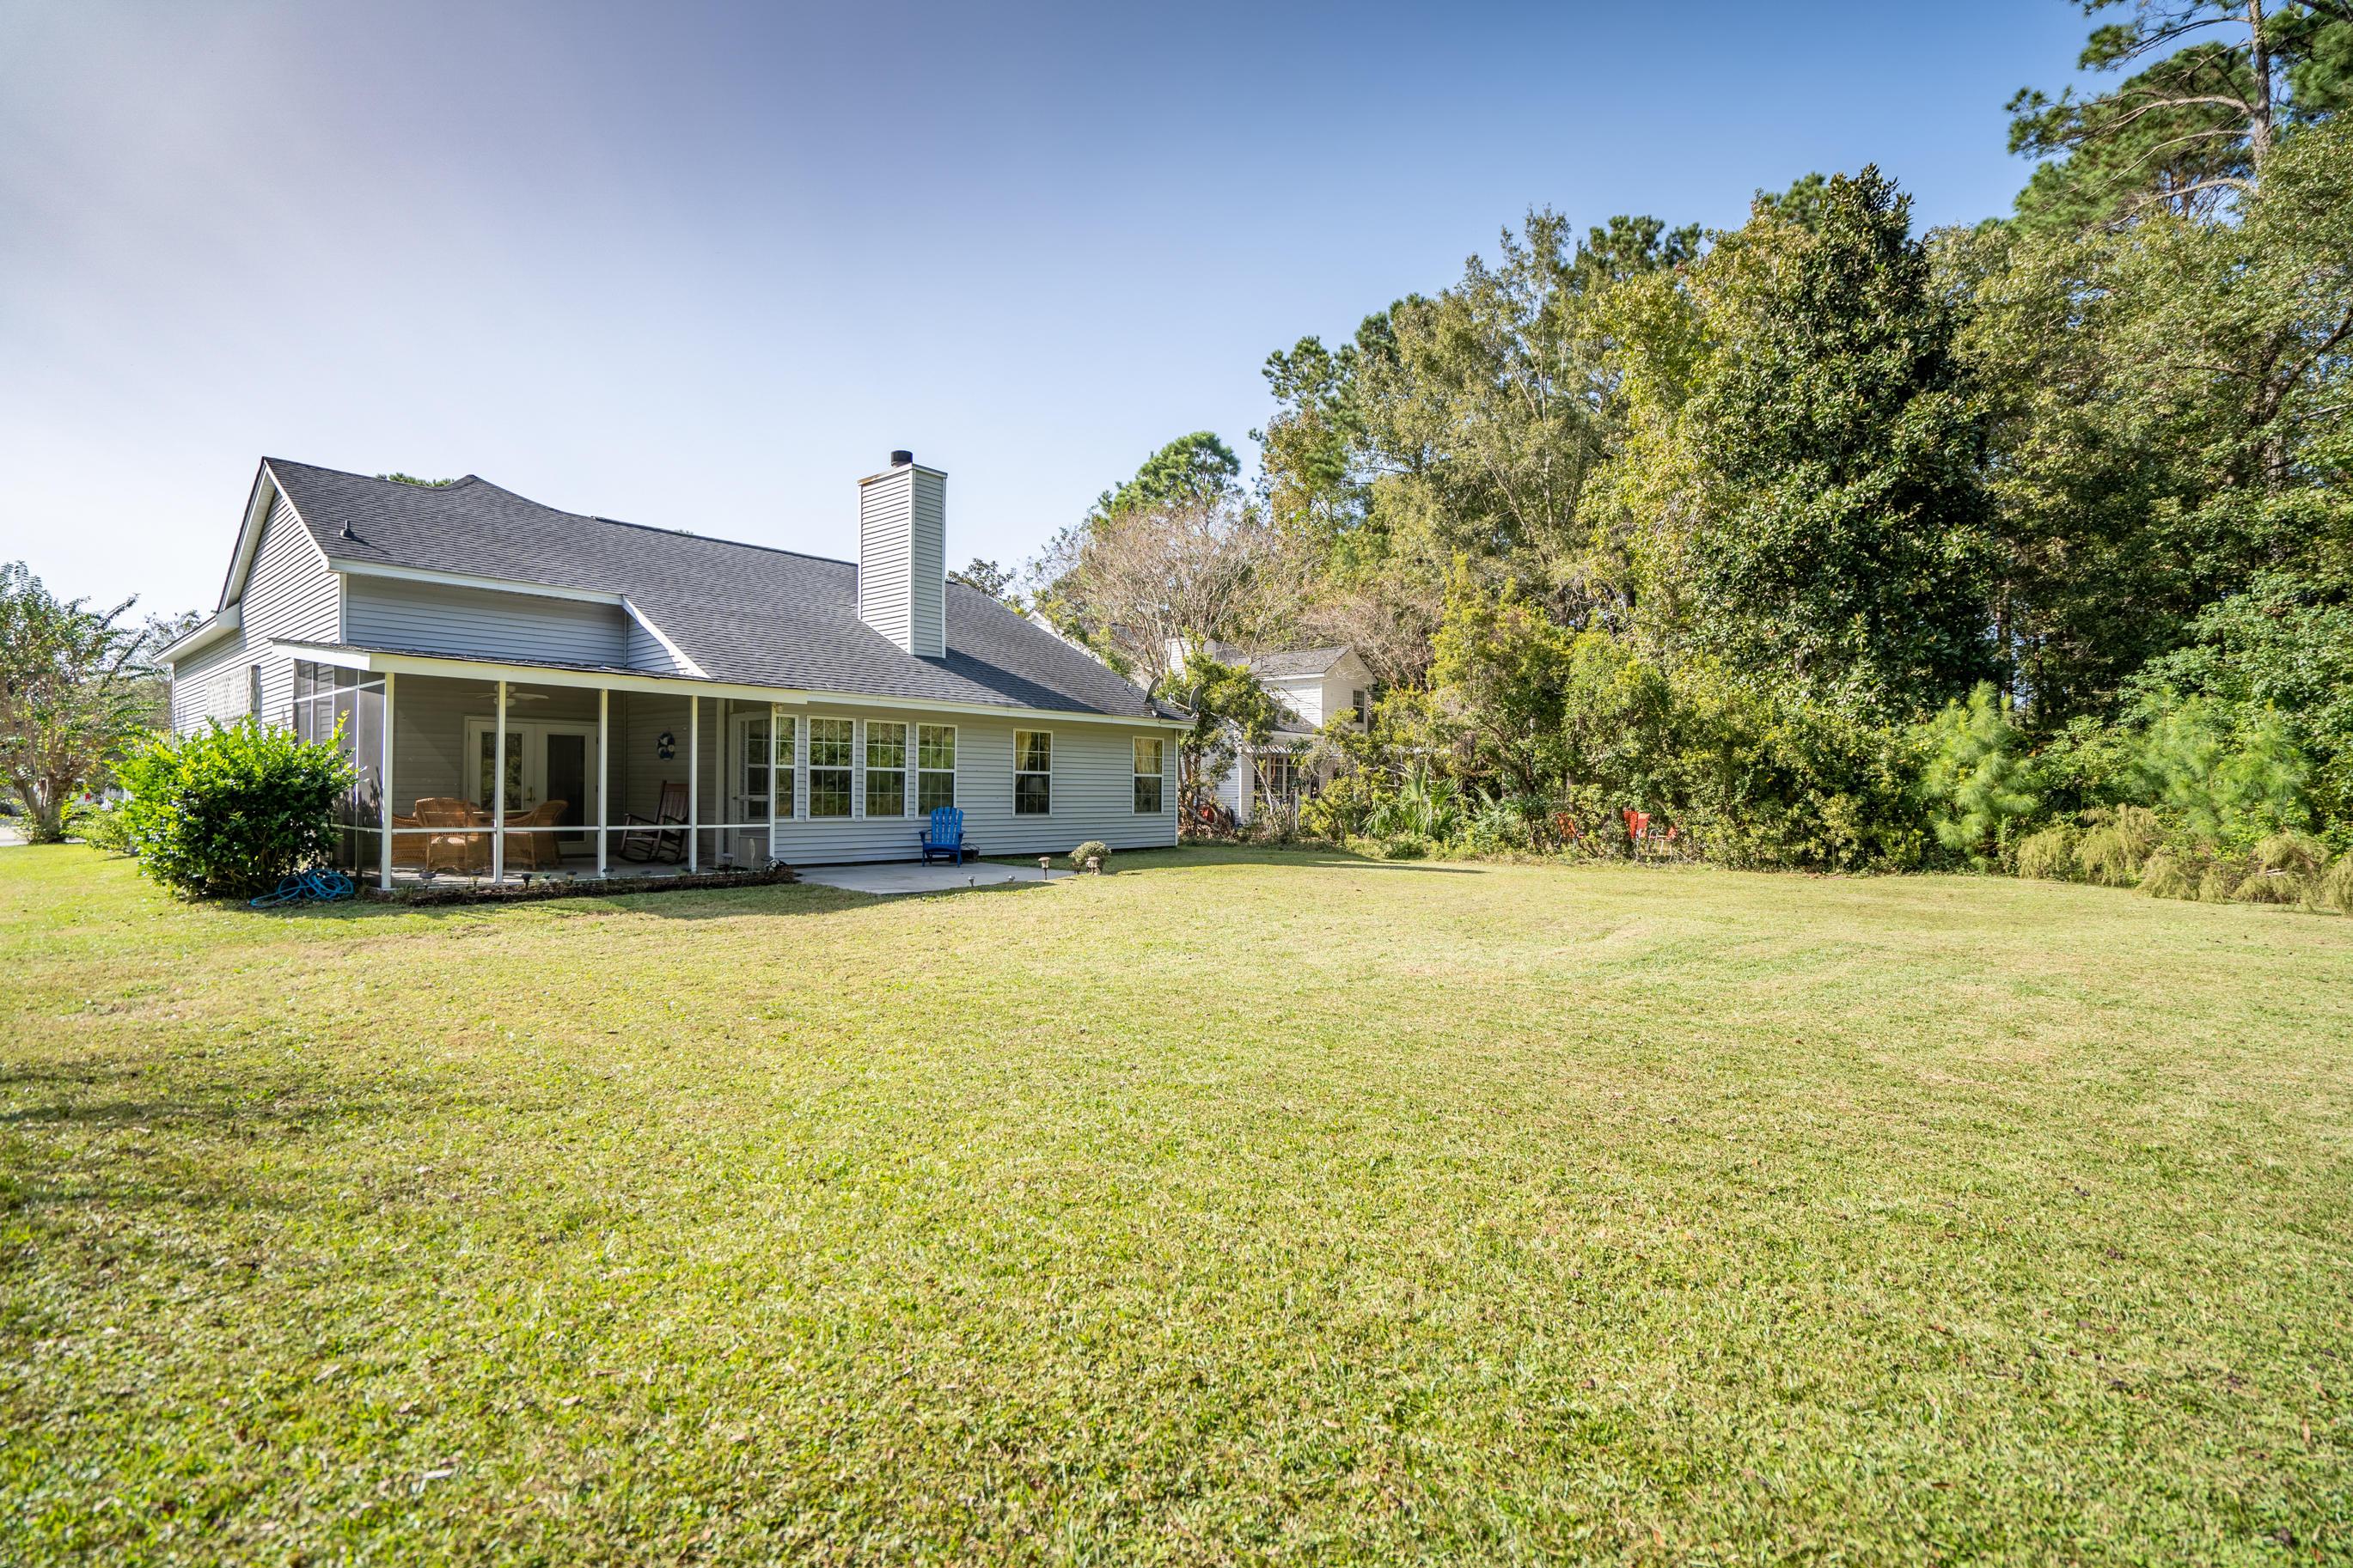 Dunes West Homes For Sale - 2780 Palmetto Hall, Mount Pleasant, SC - 1